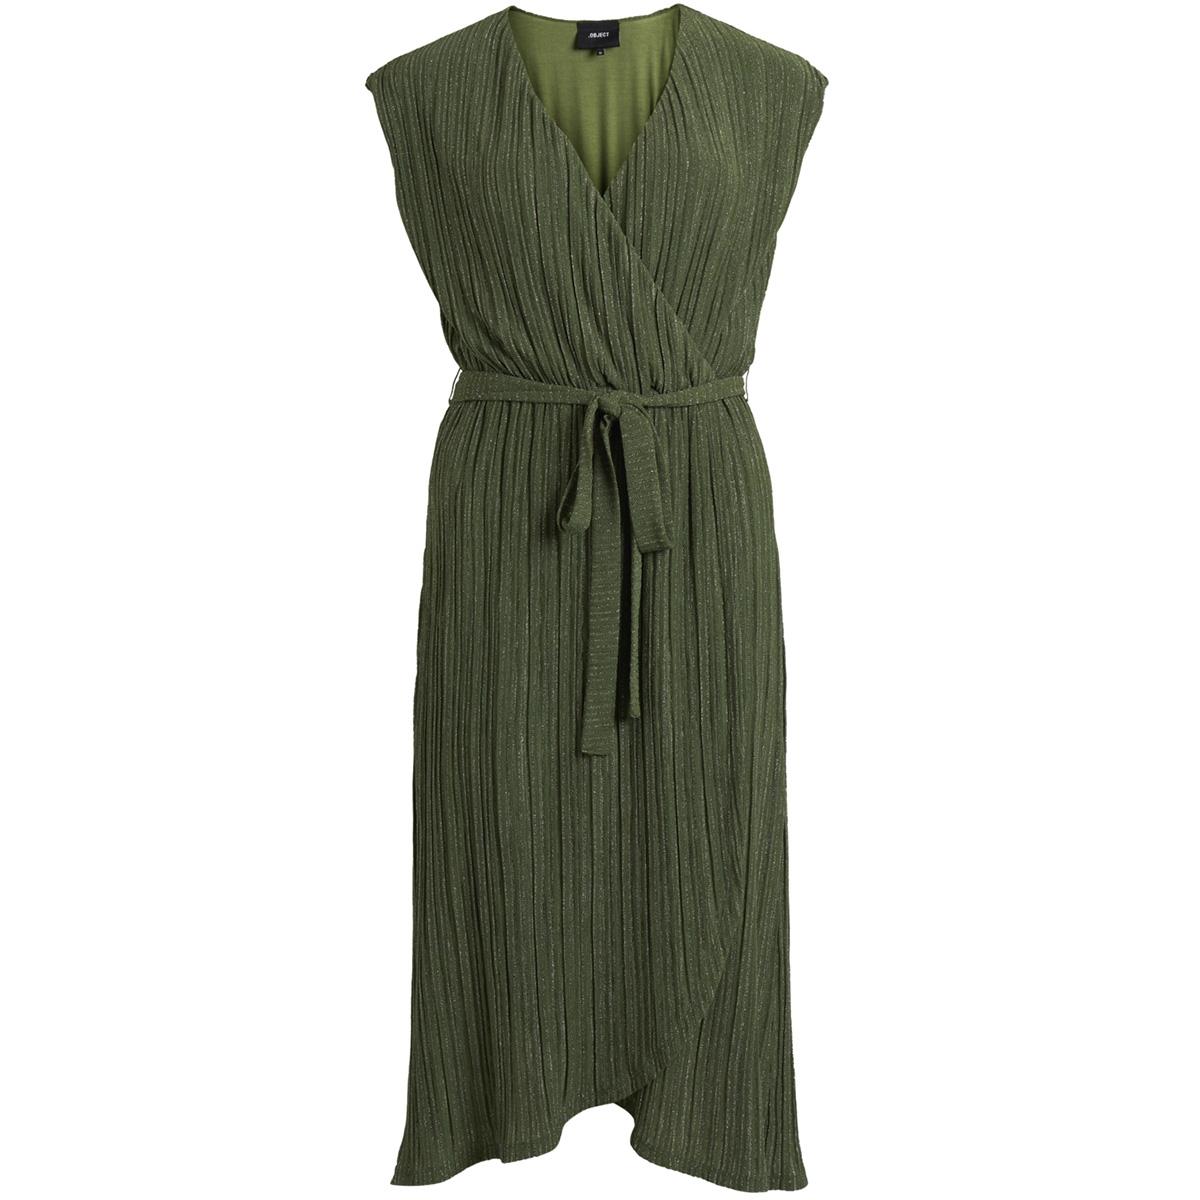 objstormi s/l jersey dress 102 23029313 object jurk black forest